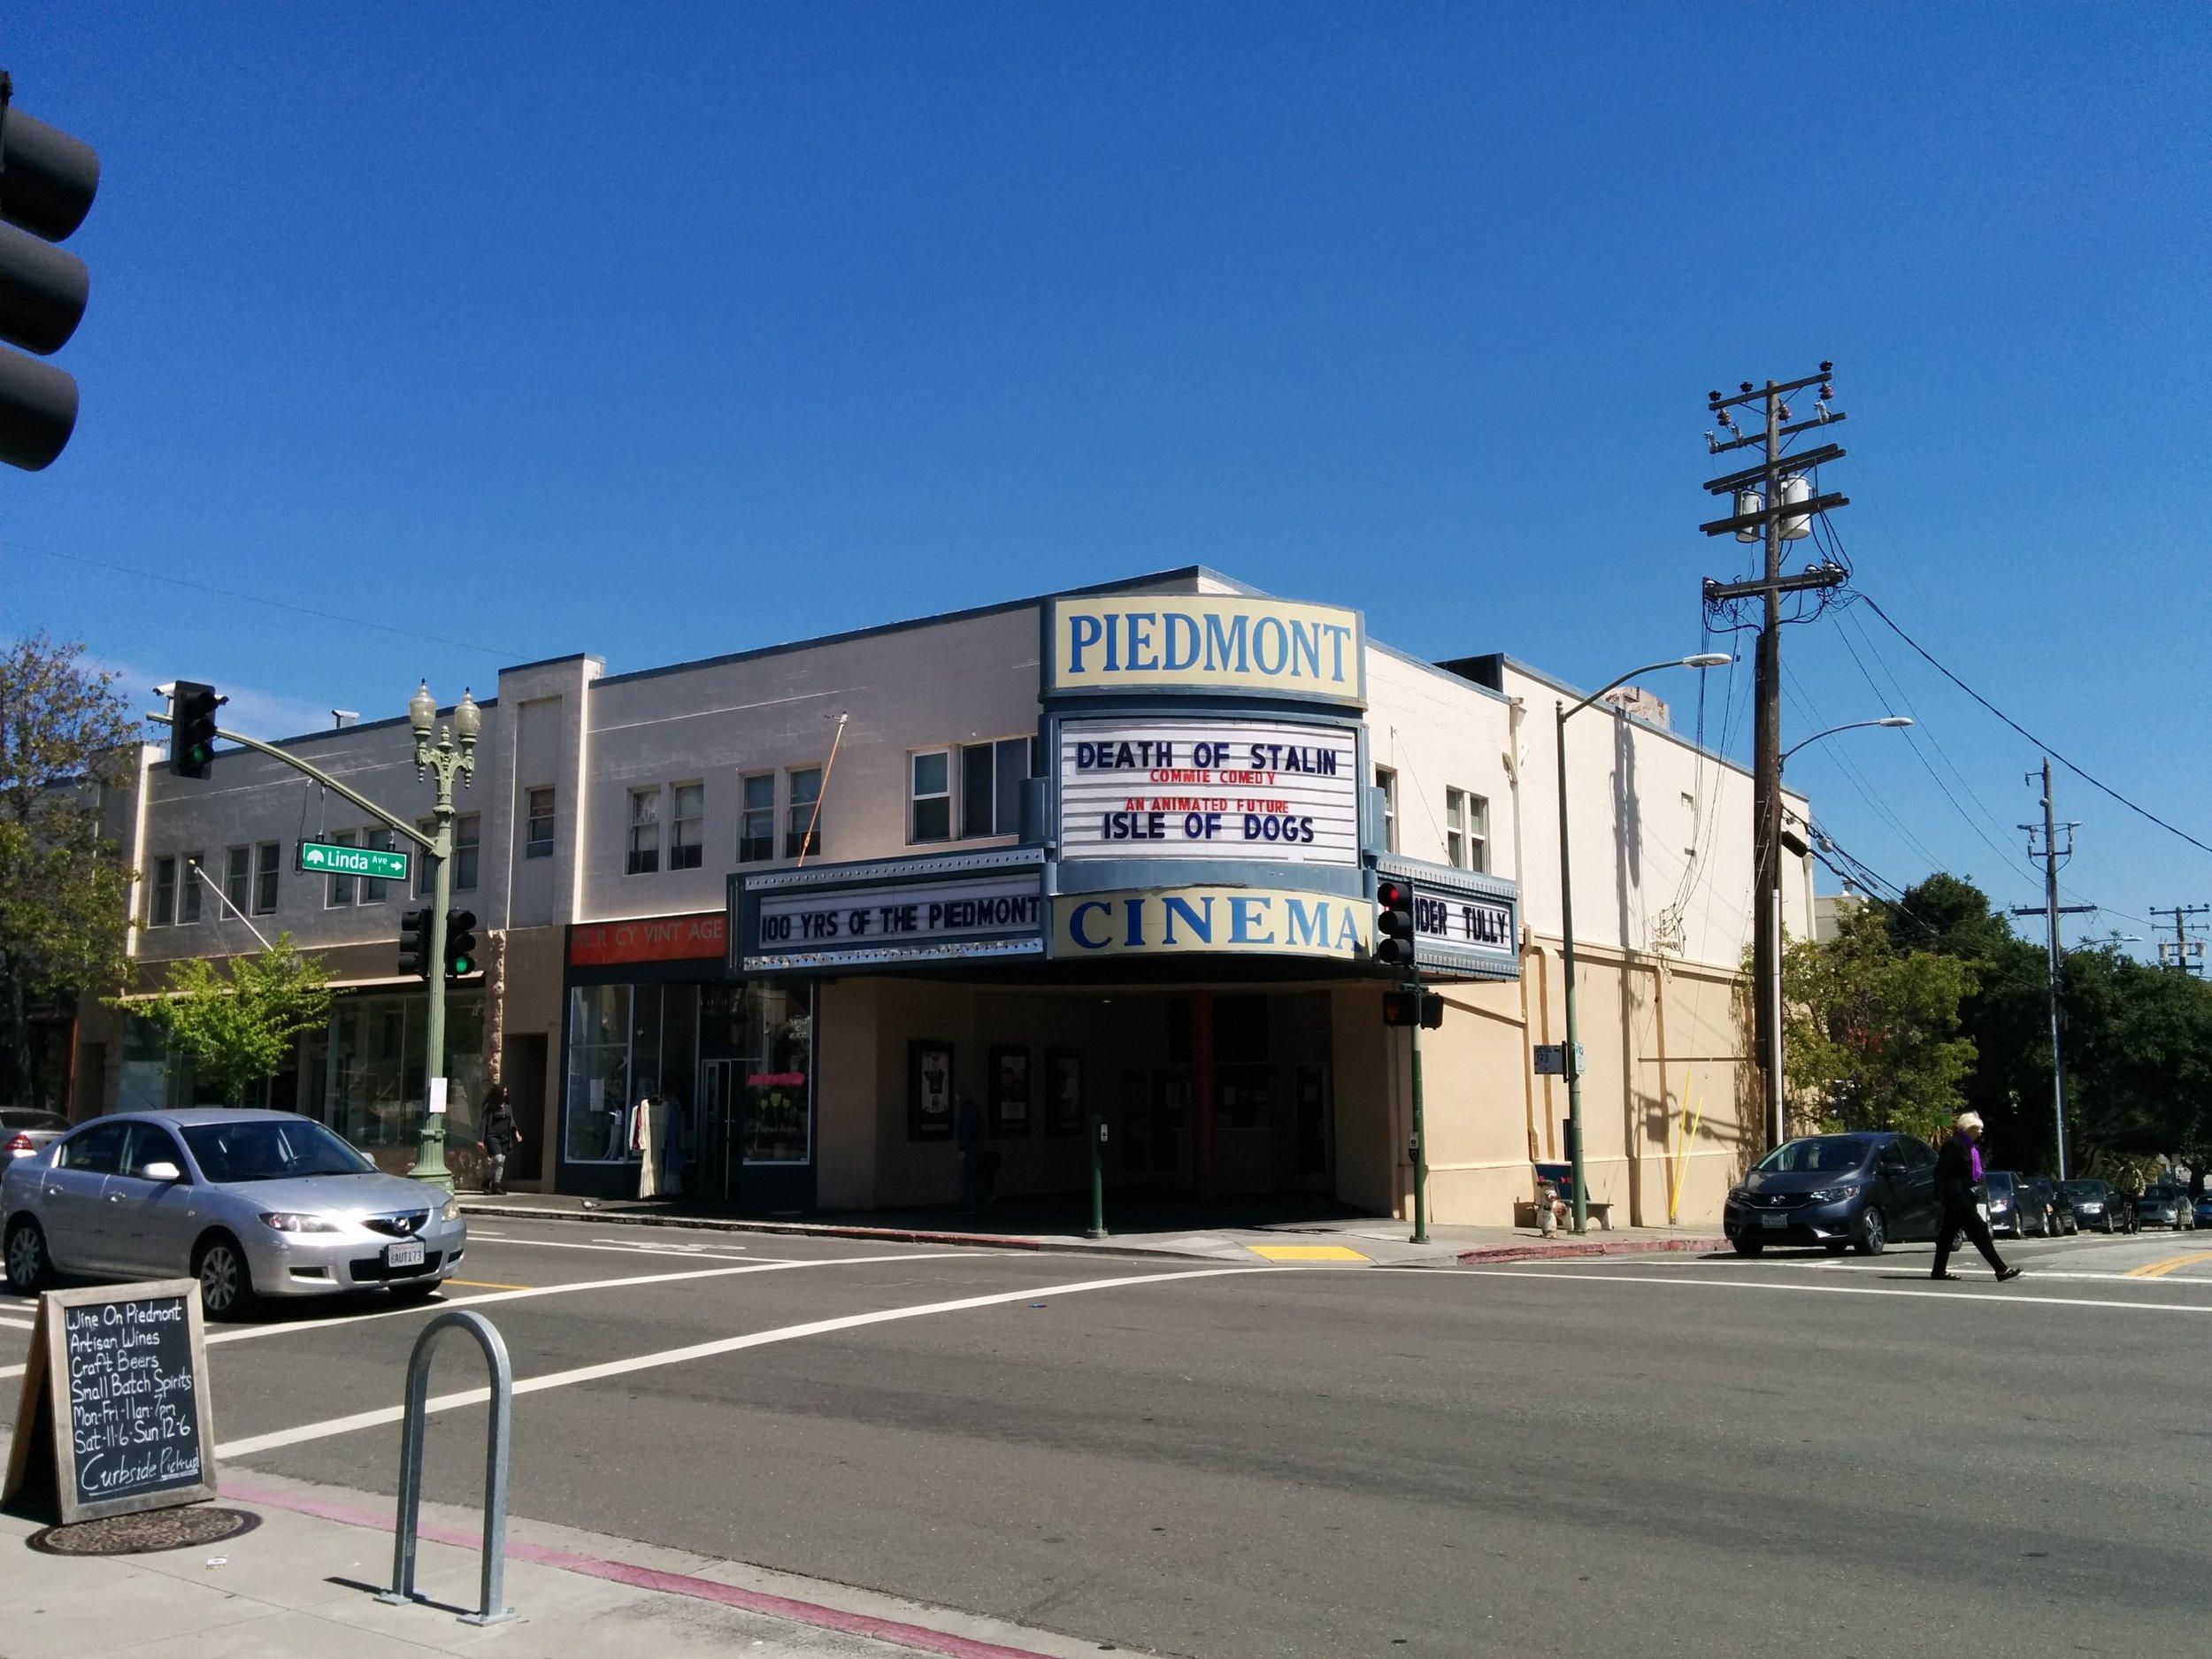 Piedmont Cinema